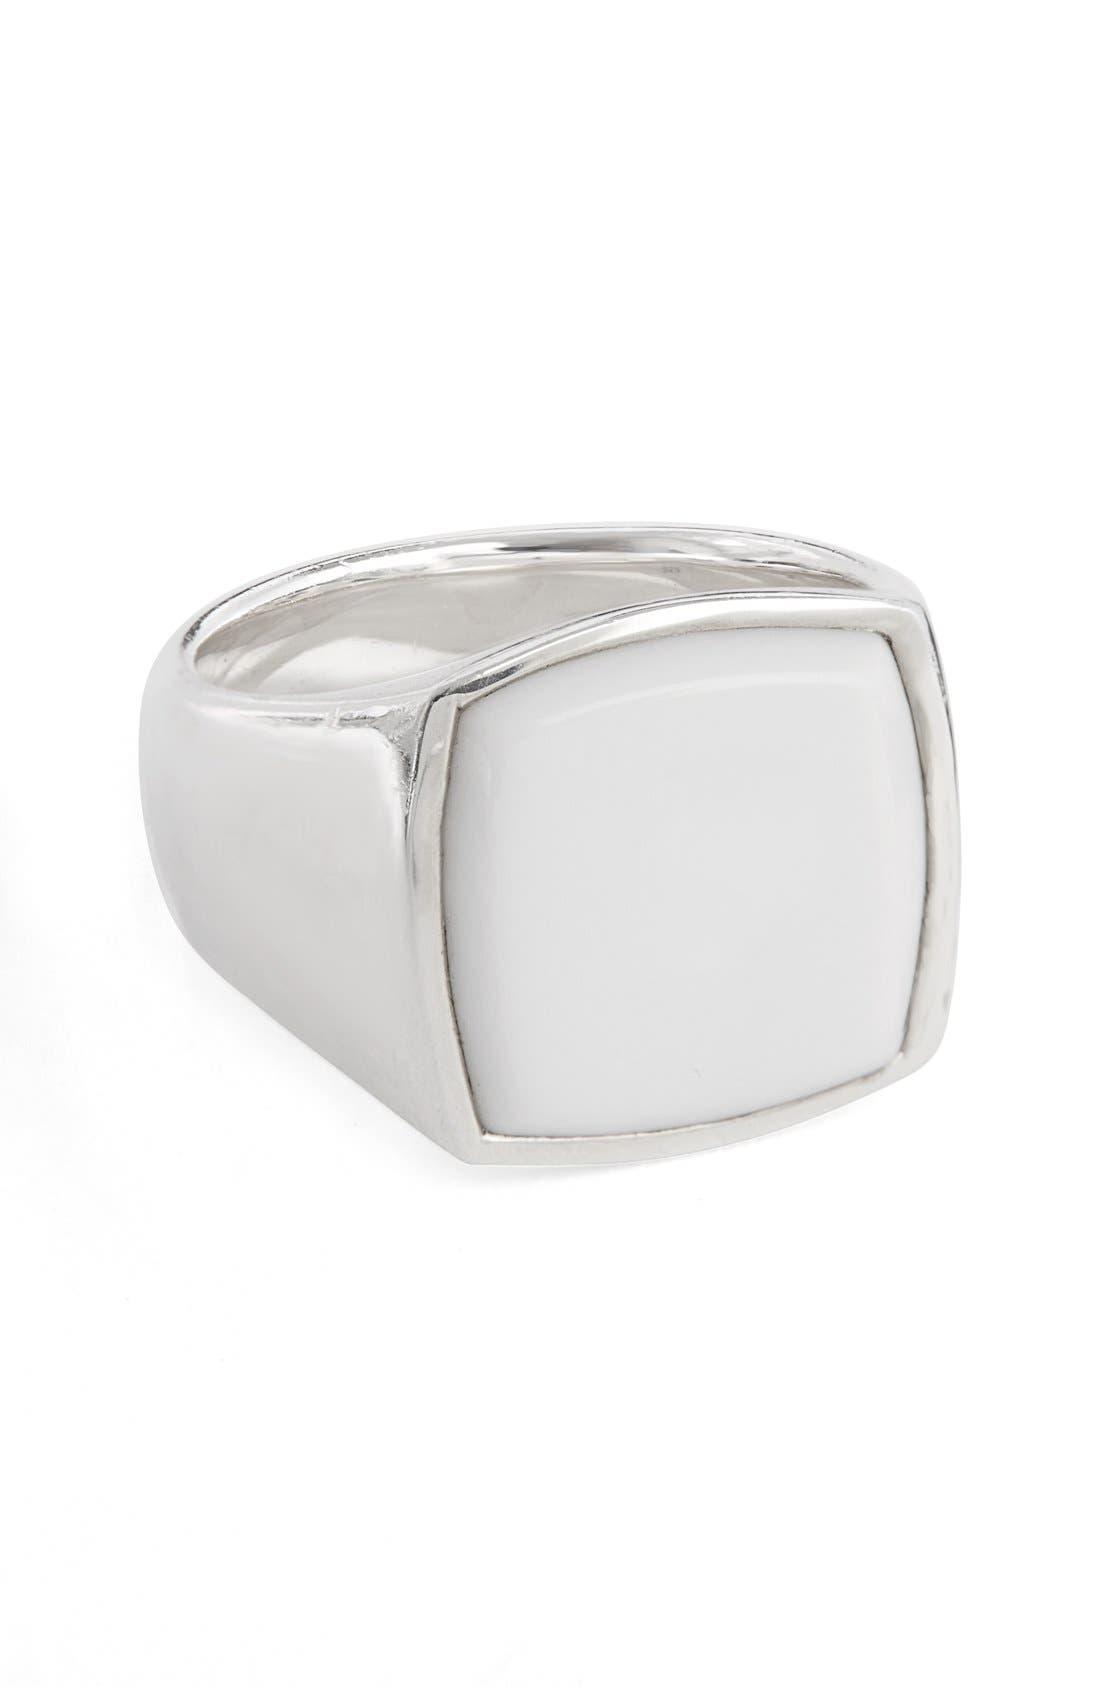 Main Image - Tom Wood White Agate Cushion Signet Ring